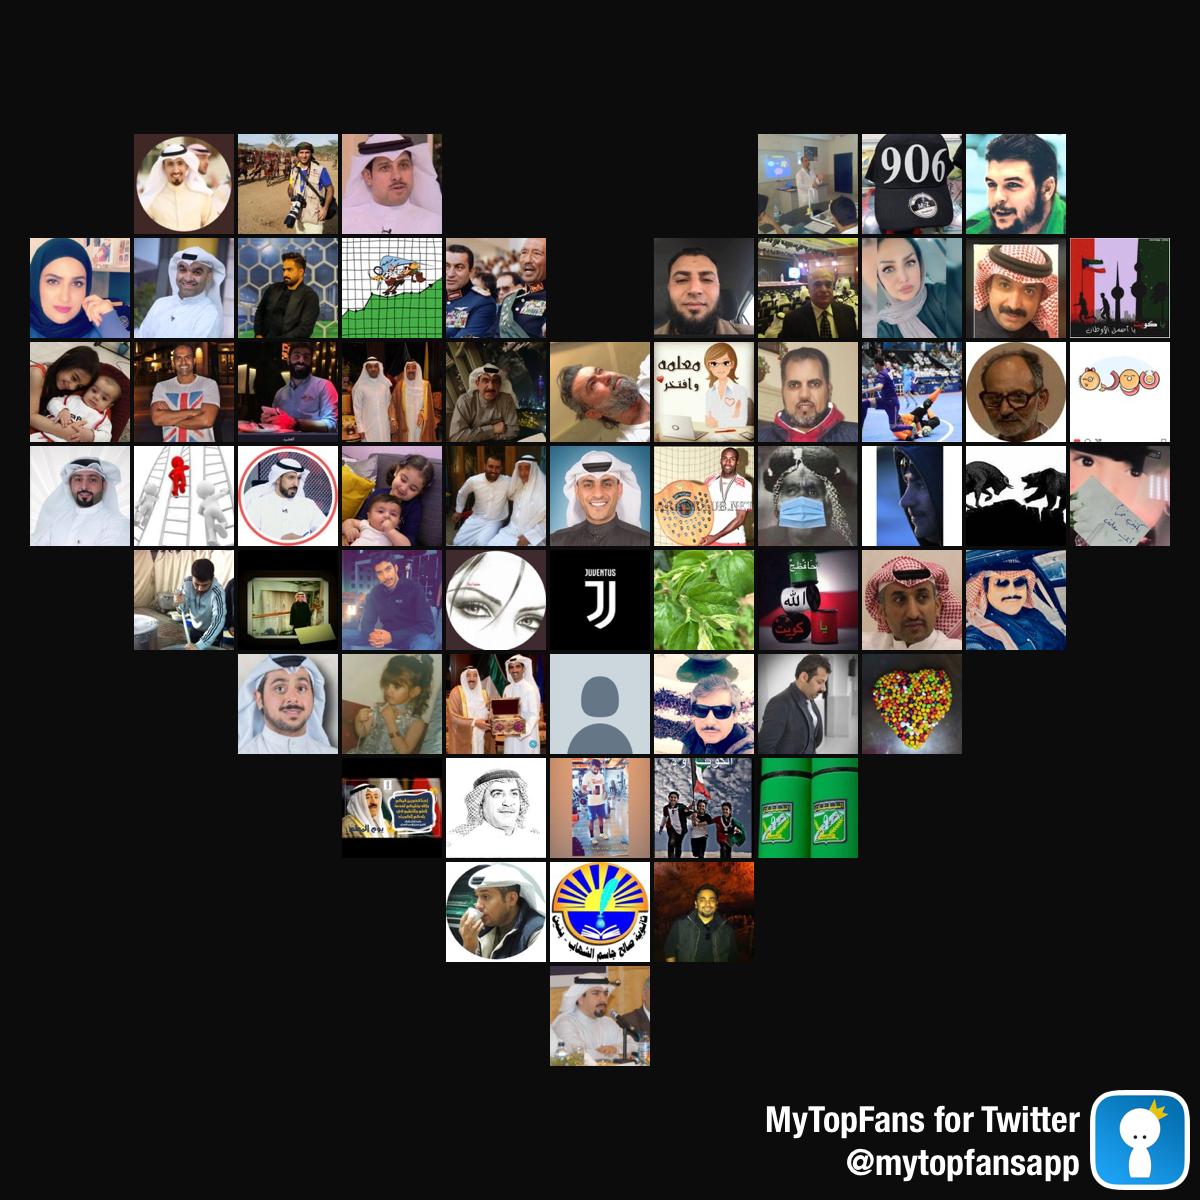 My top amazing fans #mytopfans via https://t.co/x7iq1oh7gU Do you see yourself? @algwesry @salehdashti @majedawod @AhmedEdris111 @neSUihBP1RndAvN @Je__71 @manayer_alhmadi @YAYshamsaldeen @a_mousa20 @user_alazmi https://t.co/0oeCcIGmdl